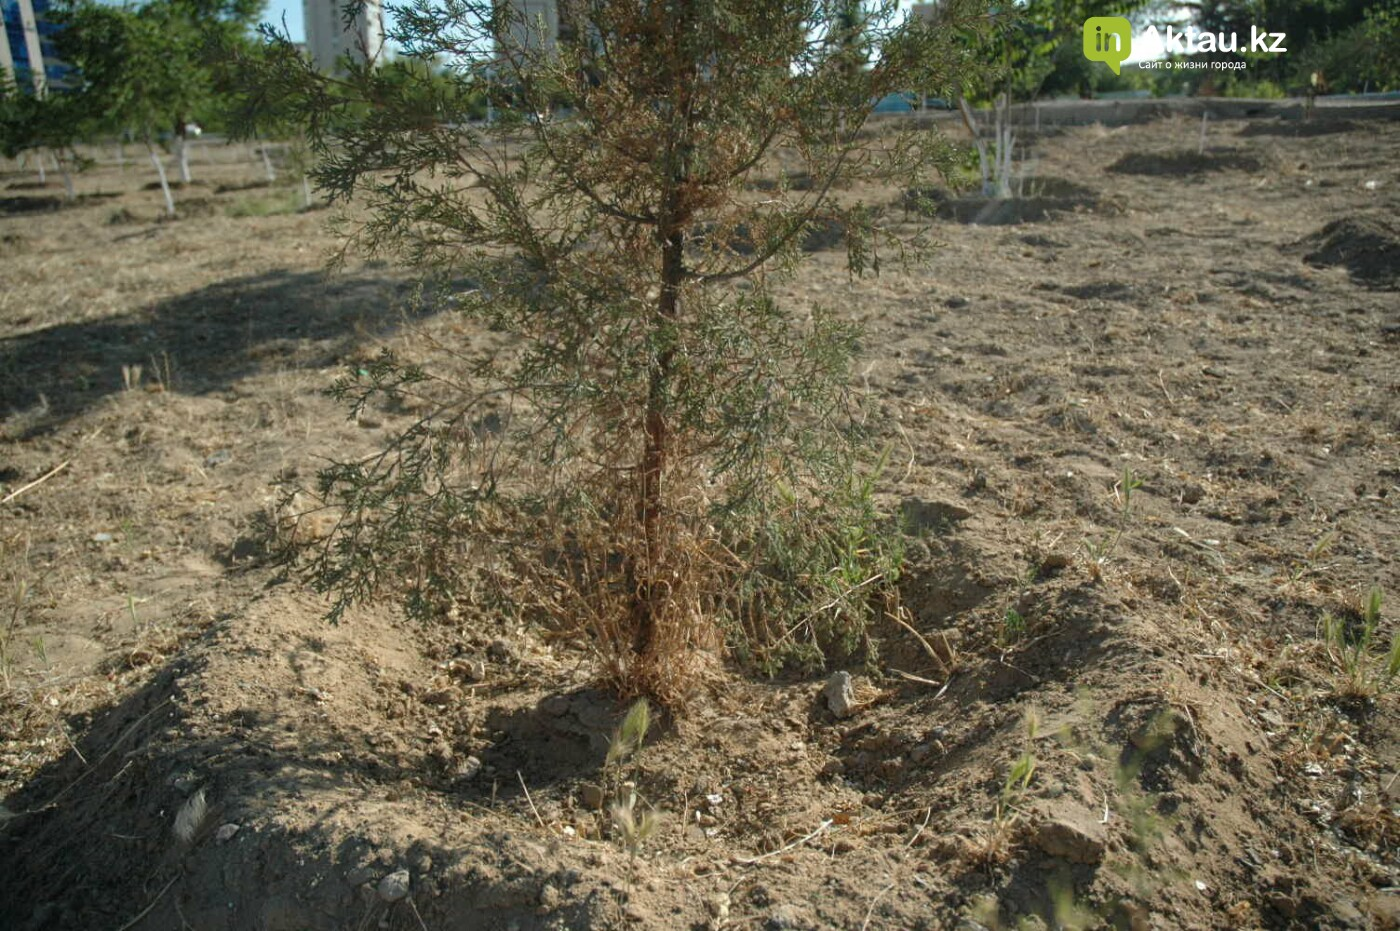 Погибшие от засухи и обезвоживания в Актау исчисляются десятками (ФОТО), фото-36